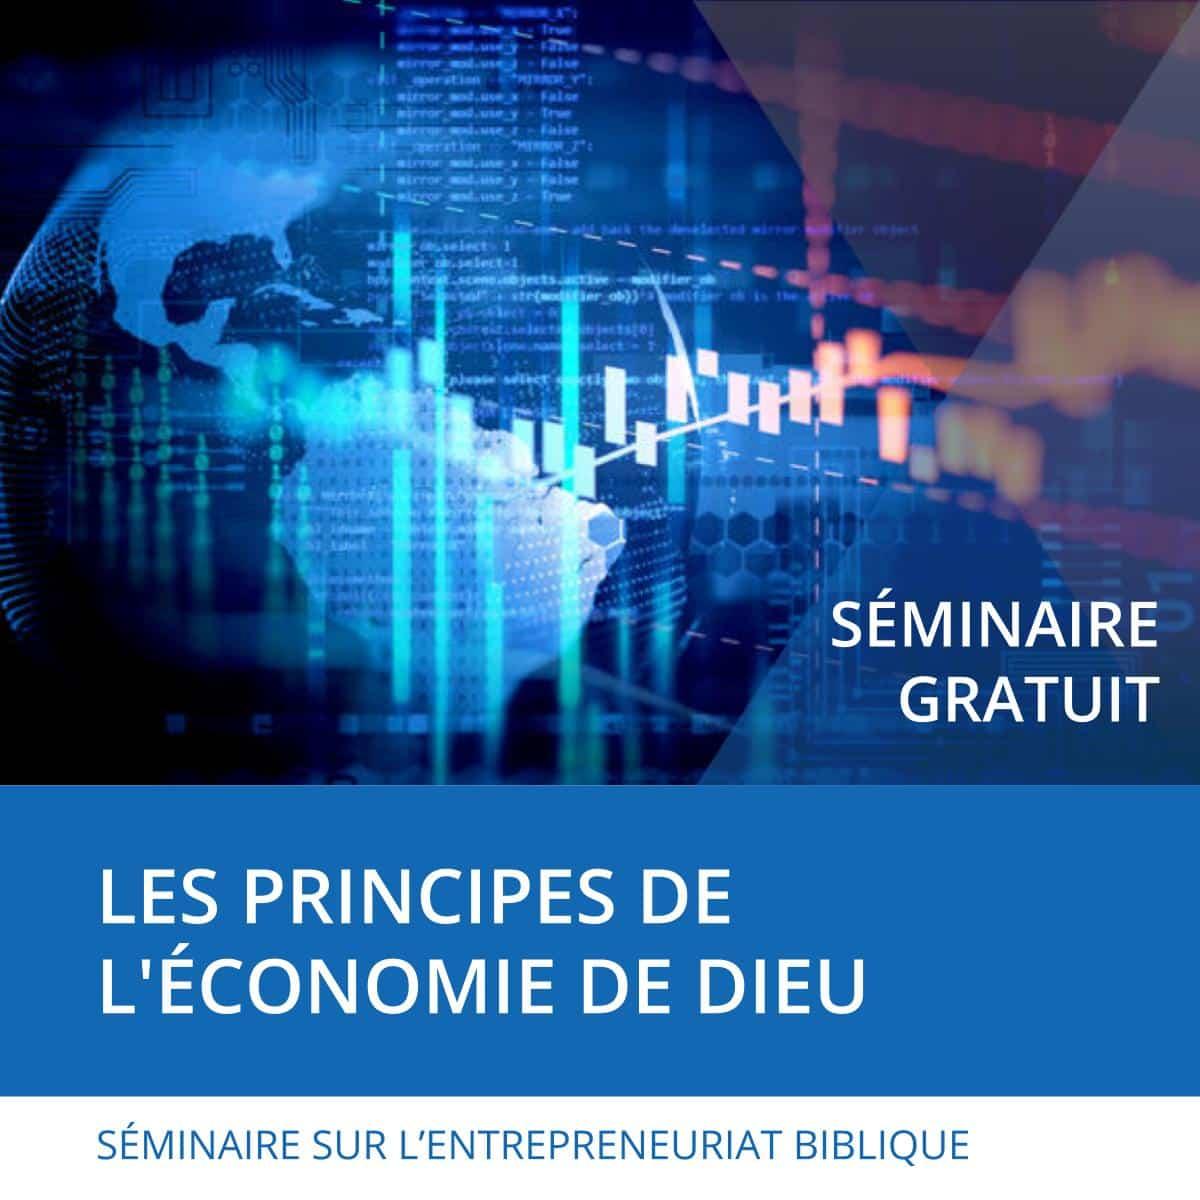 BE Seminar Promo All Topics Social Media FR 10 - Nehemiah E-Community